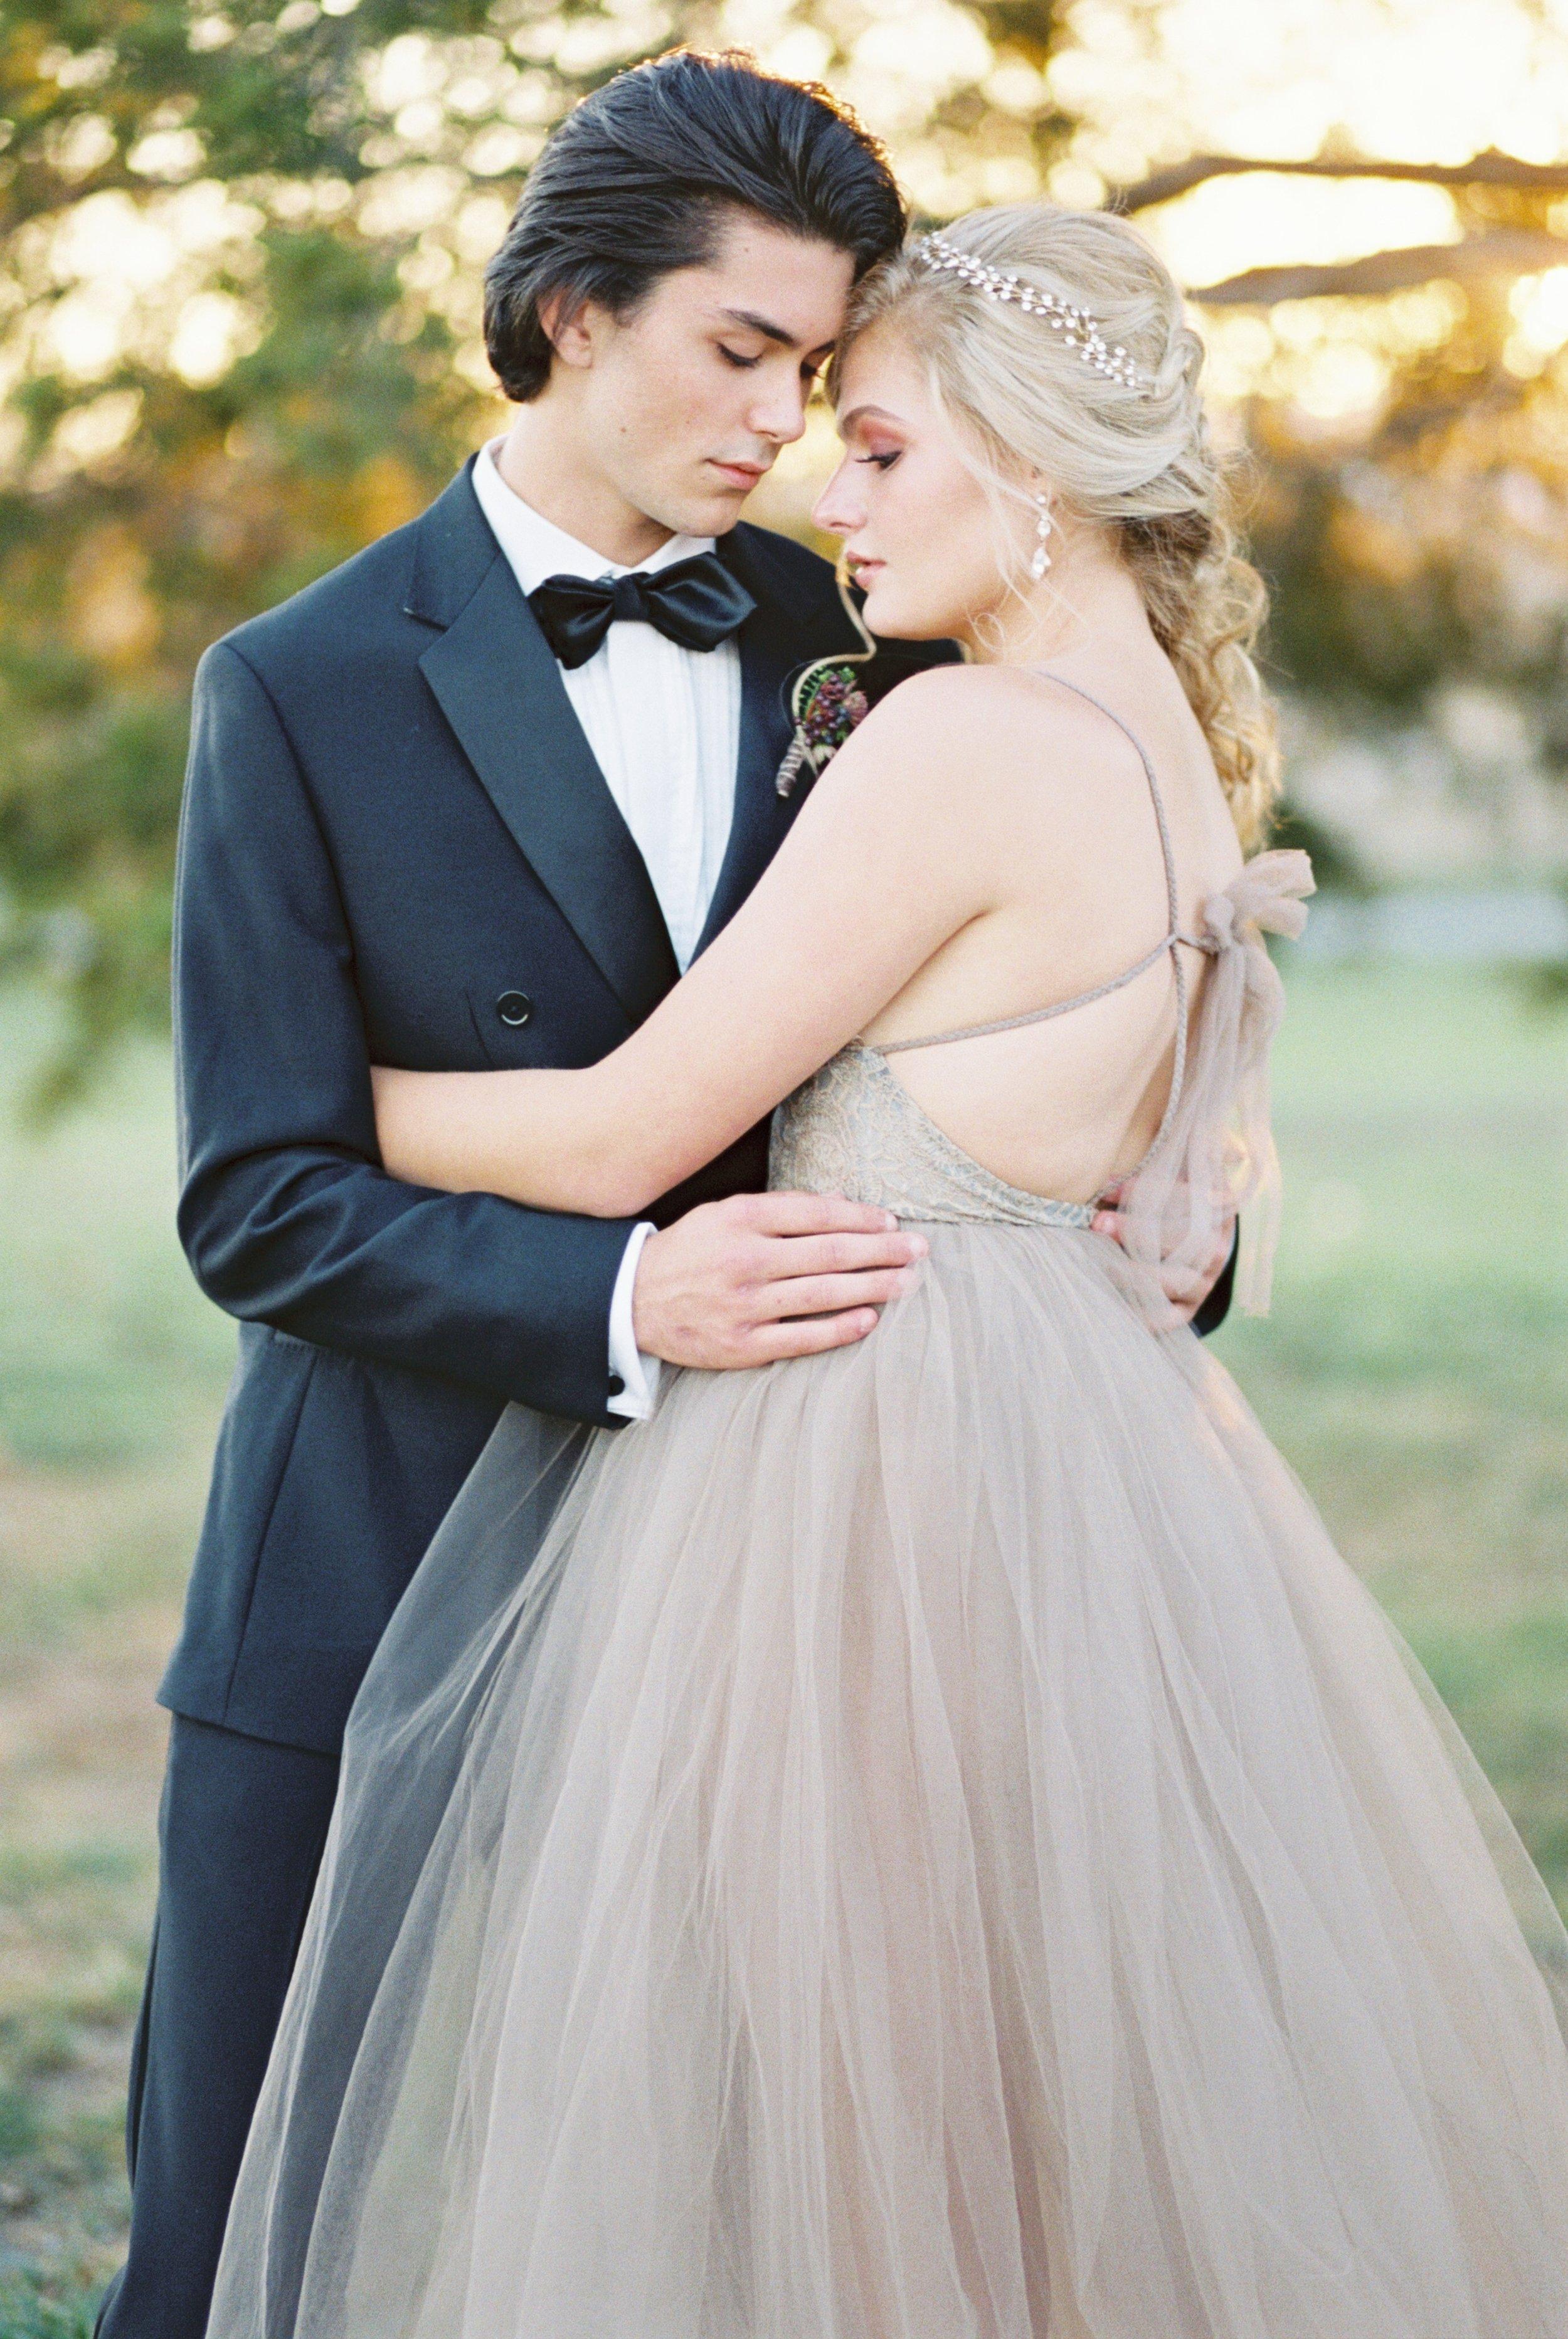 the-black-tux-groom-wedding-attire